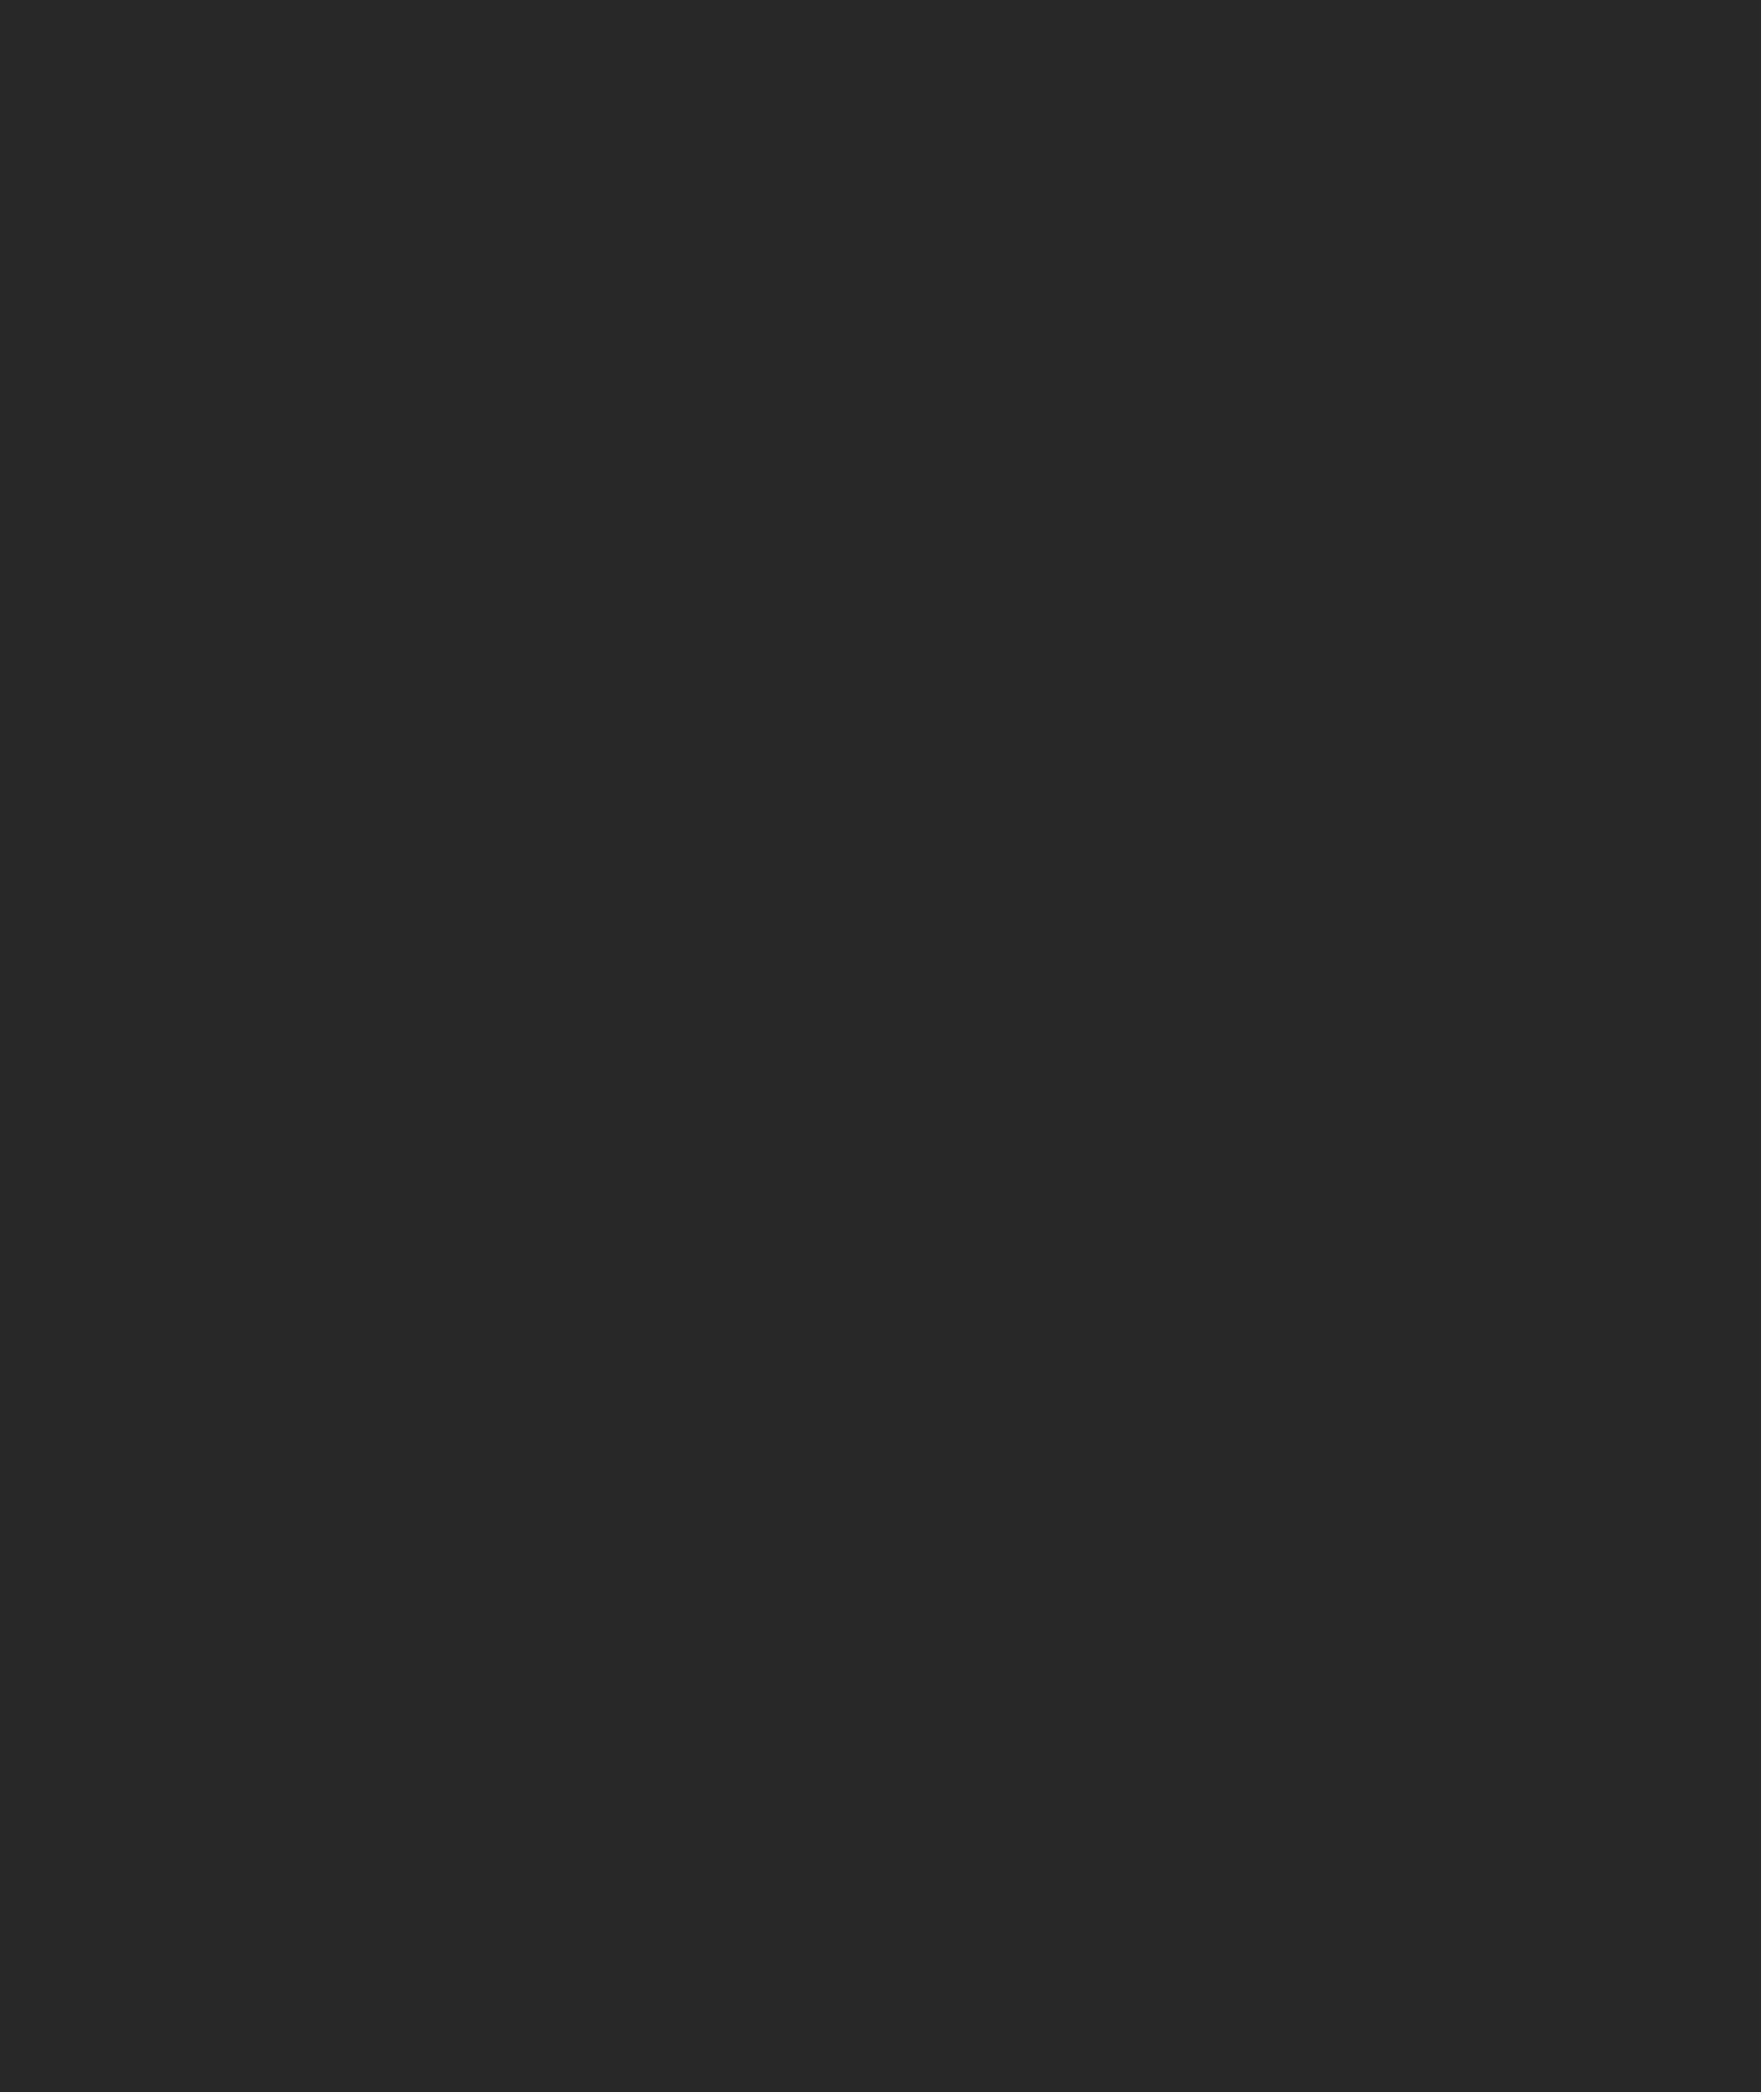 bisol-logo.png